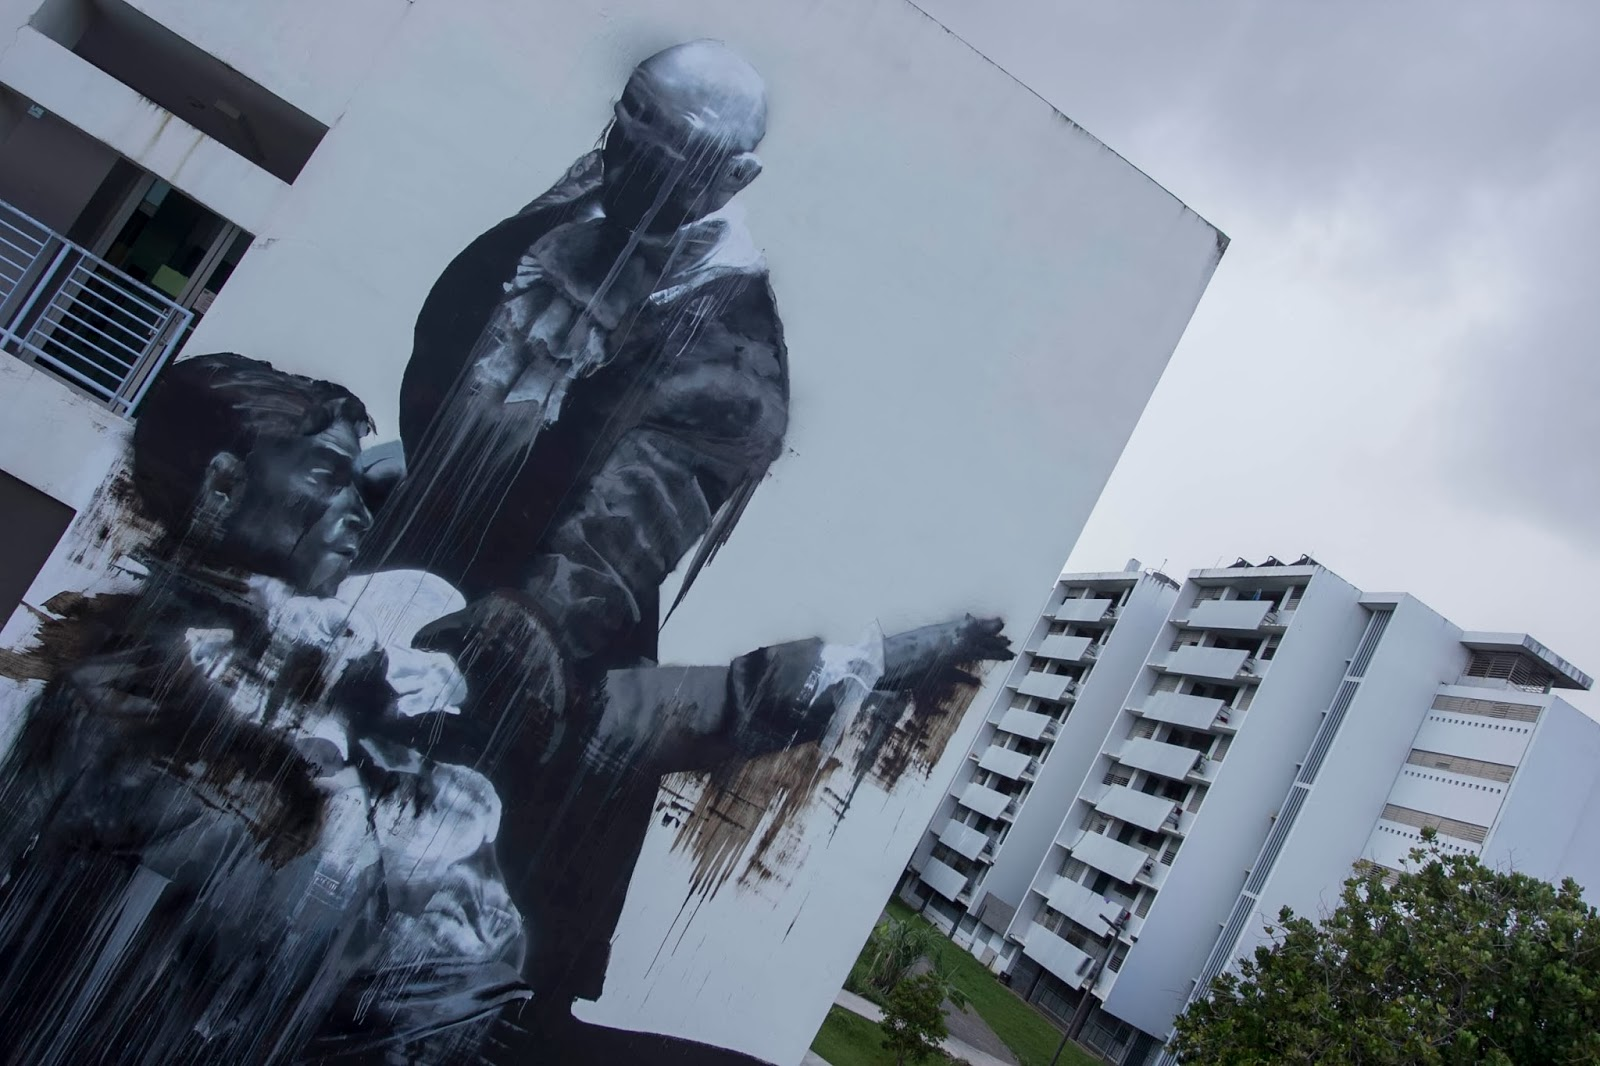 conor-harrington-new-mural-for-los-muros-hablan-festival-02